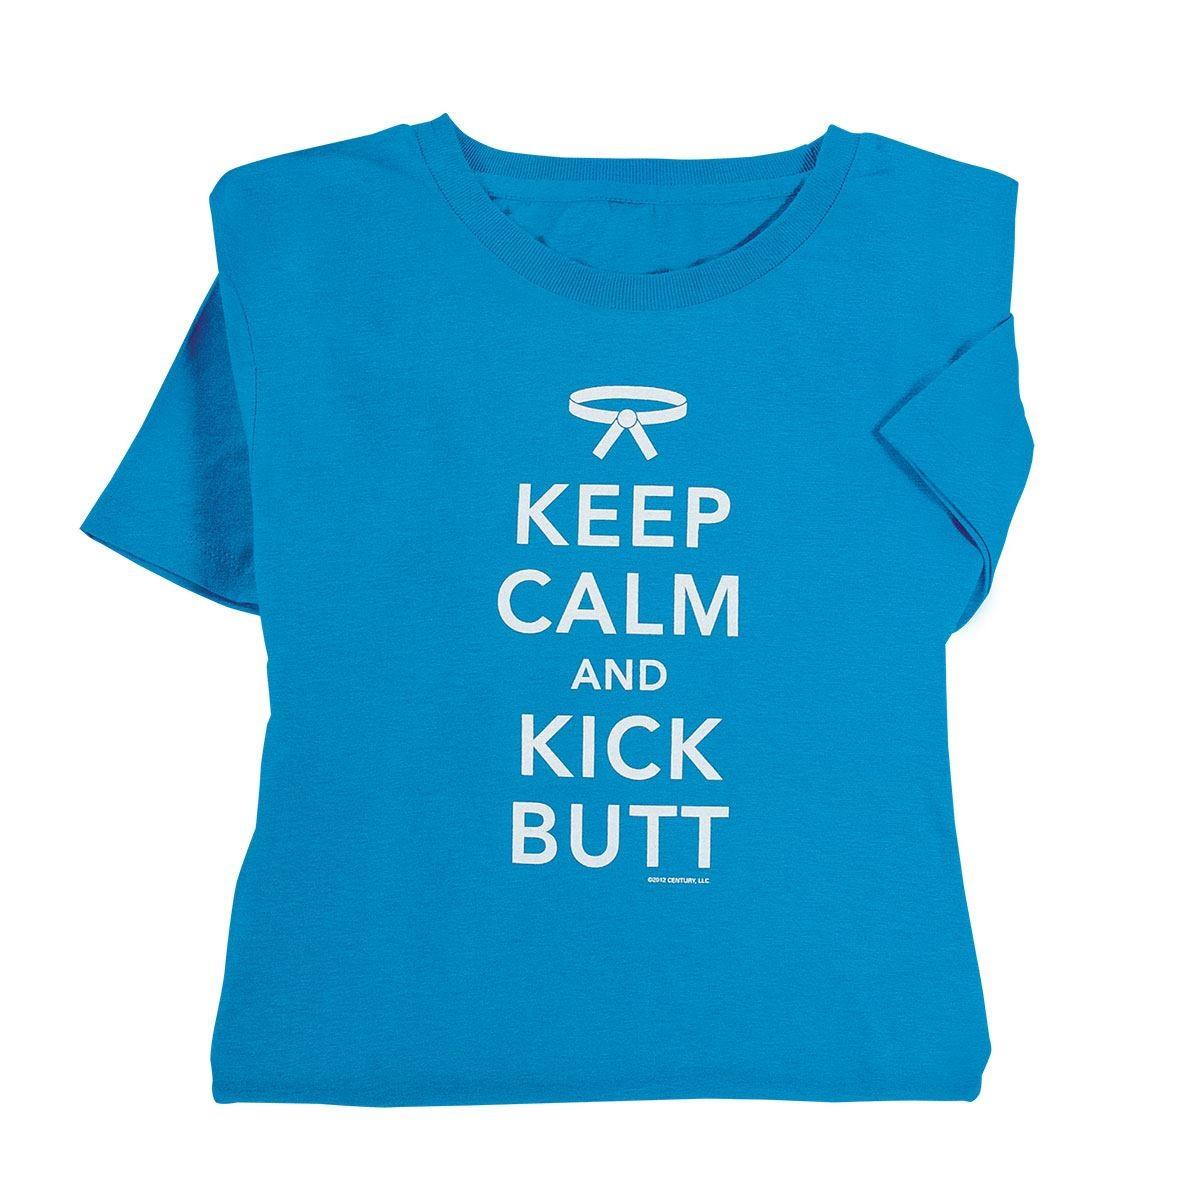 Martial Arts Karate  Keep Calm and Kick Butt T-Shirt